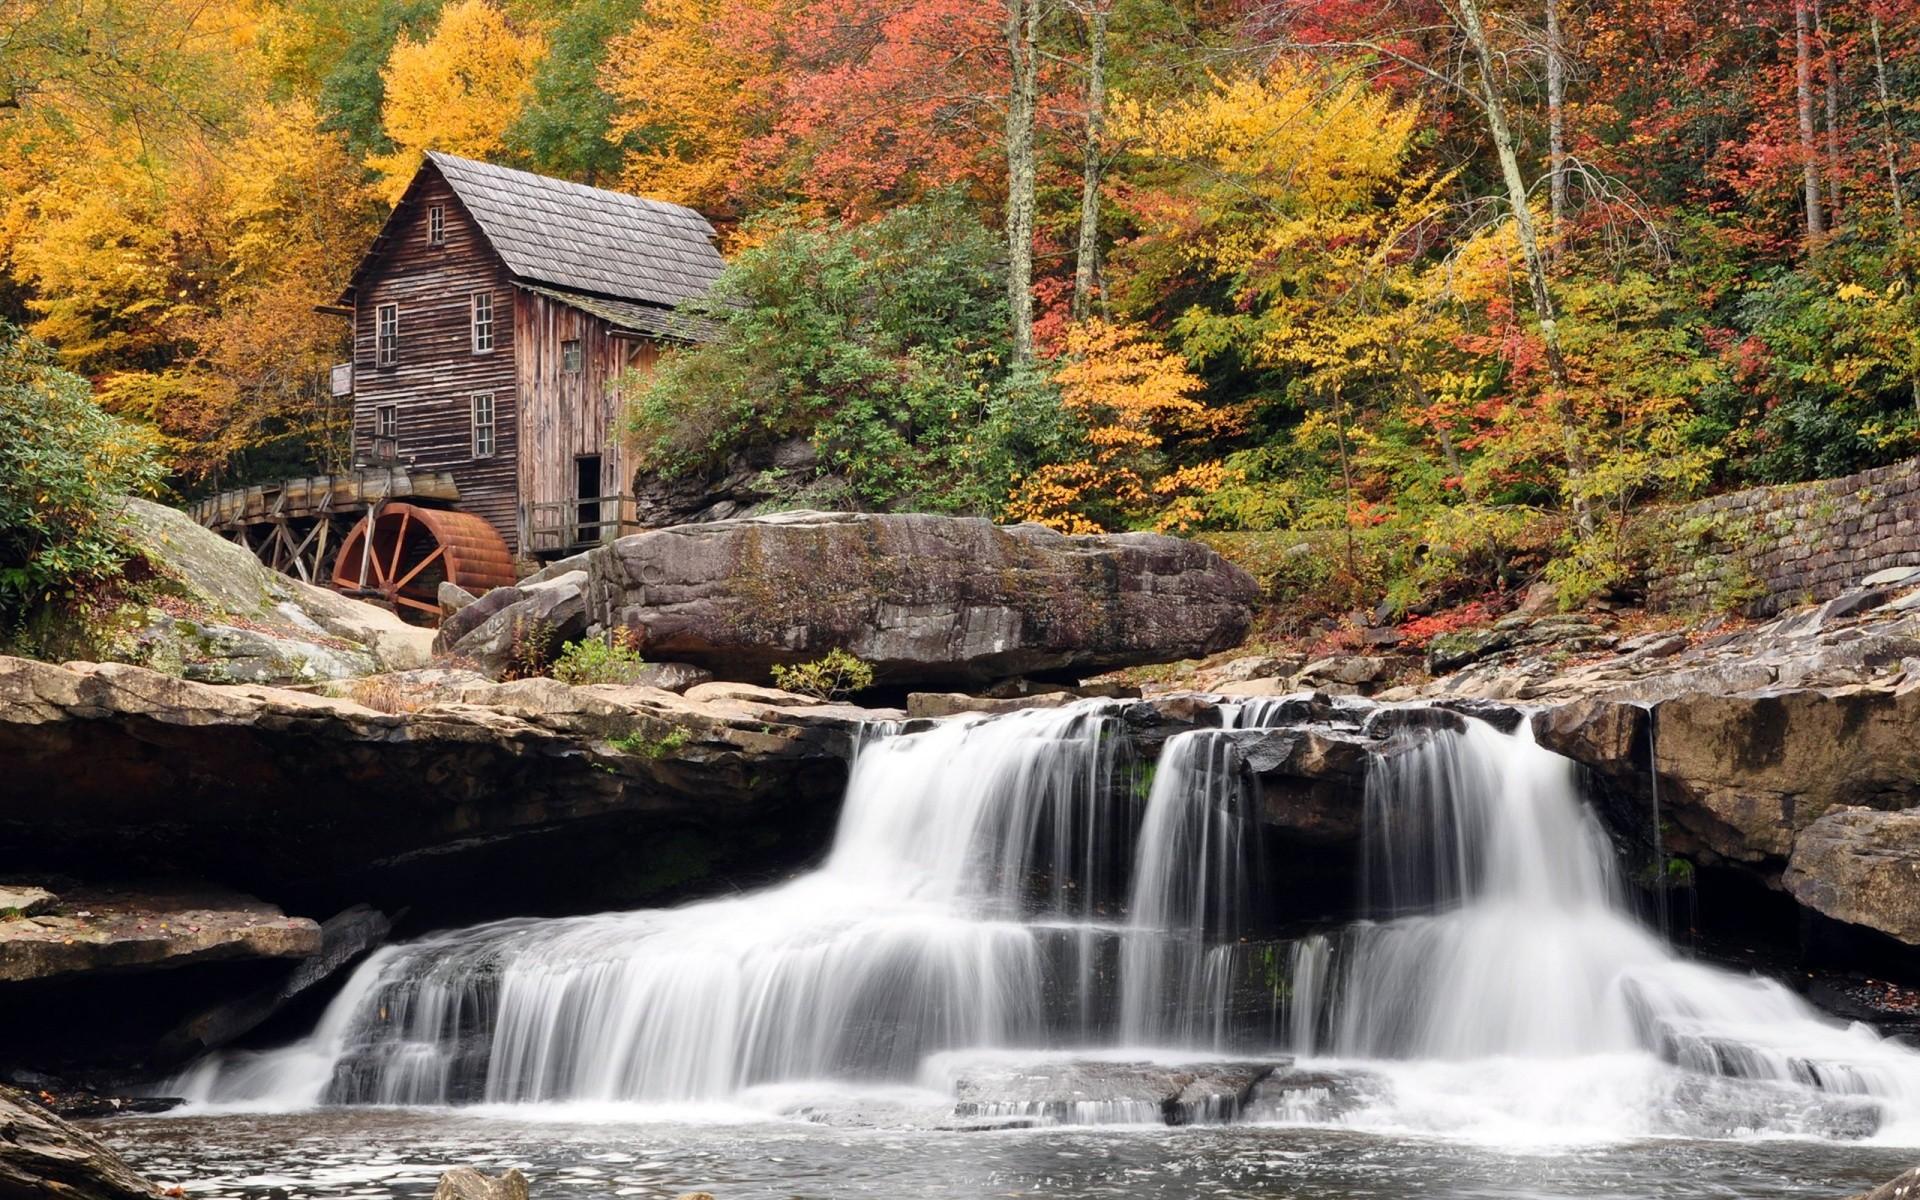 waterfall wallpaper hd nature. Â«Â«